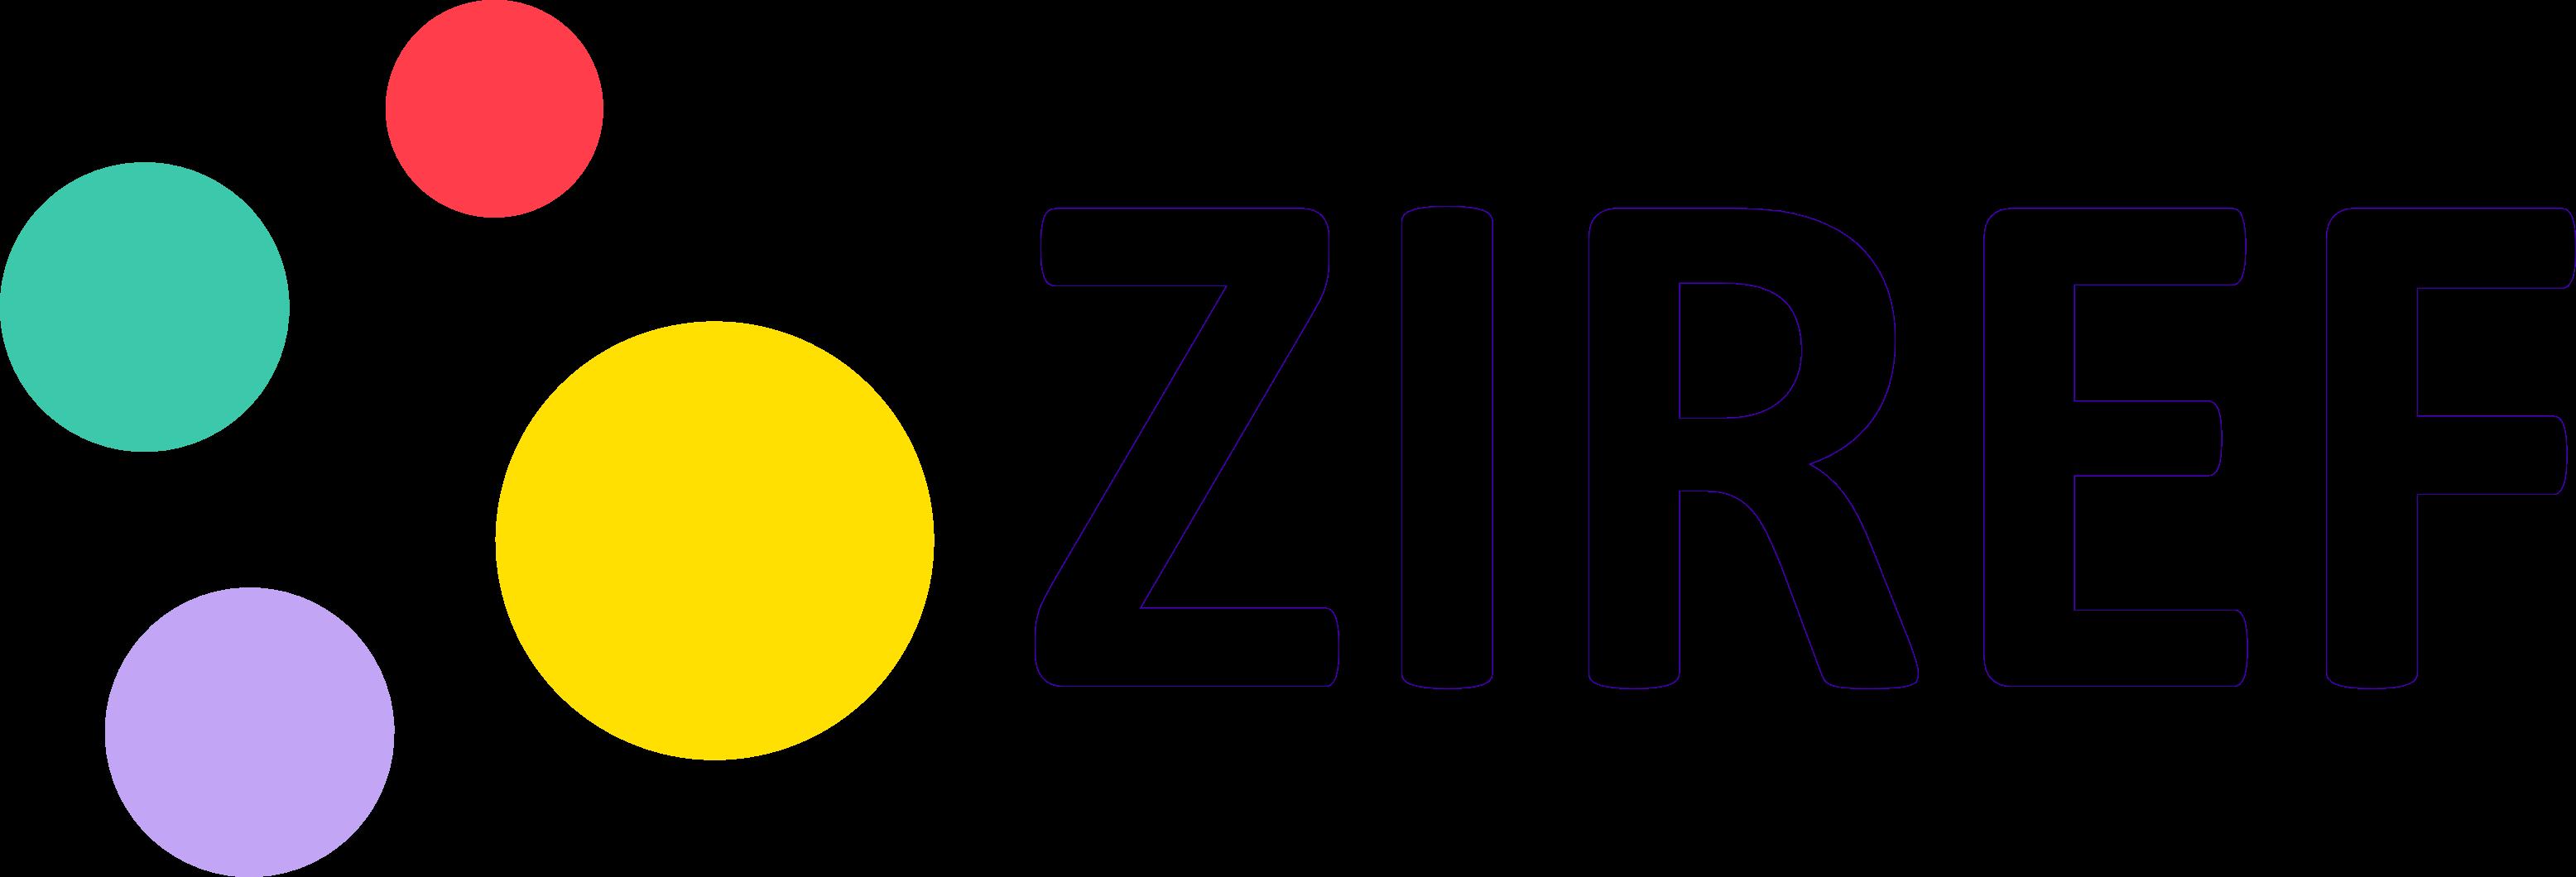 ZIREF logo